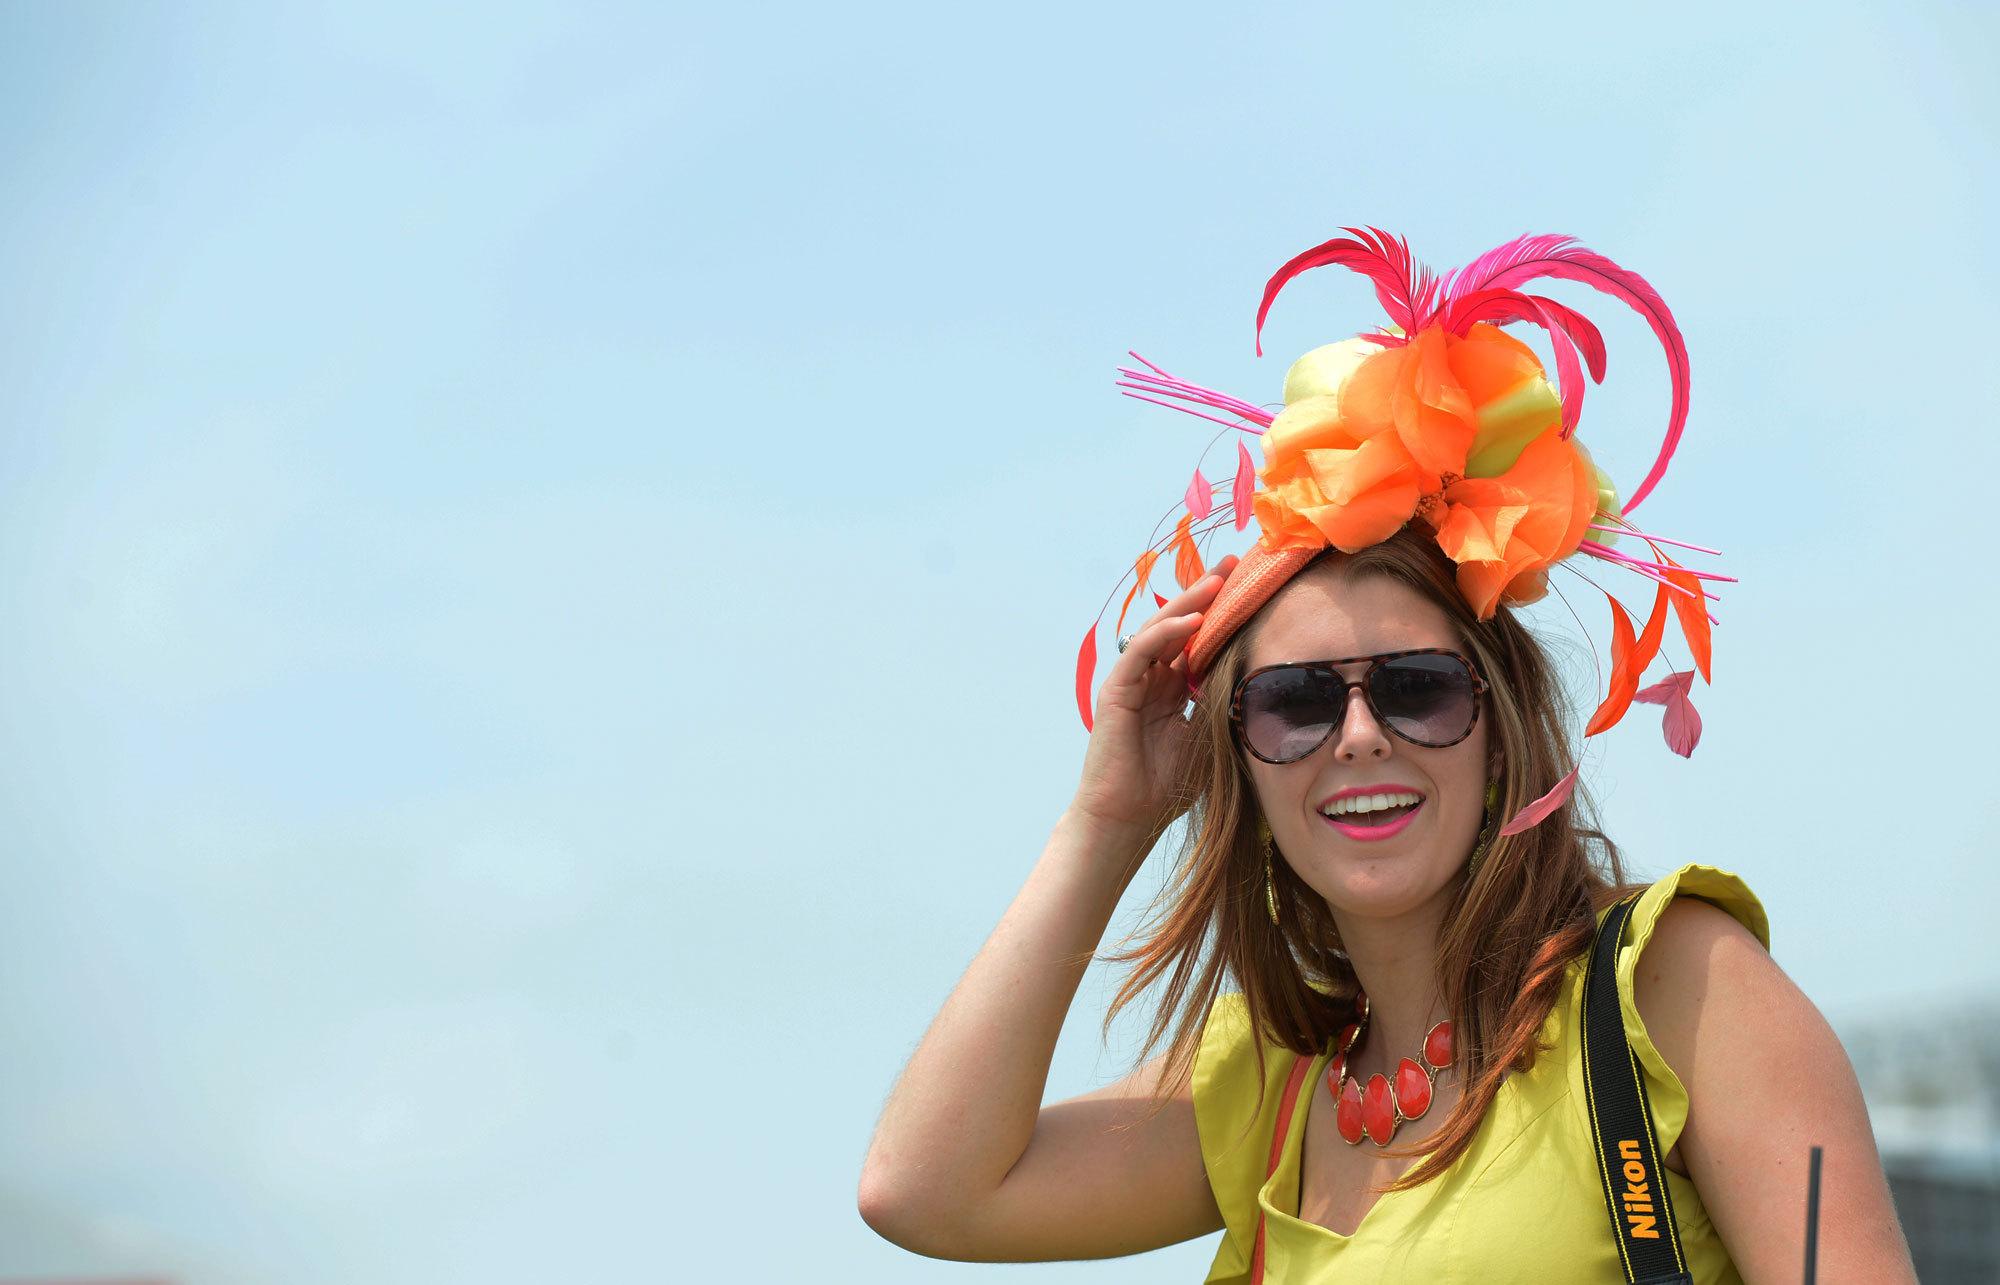 Preakness 2015 hats and fashion - Baltimore Sun 6896ca3ae18